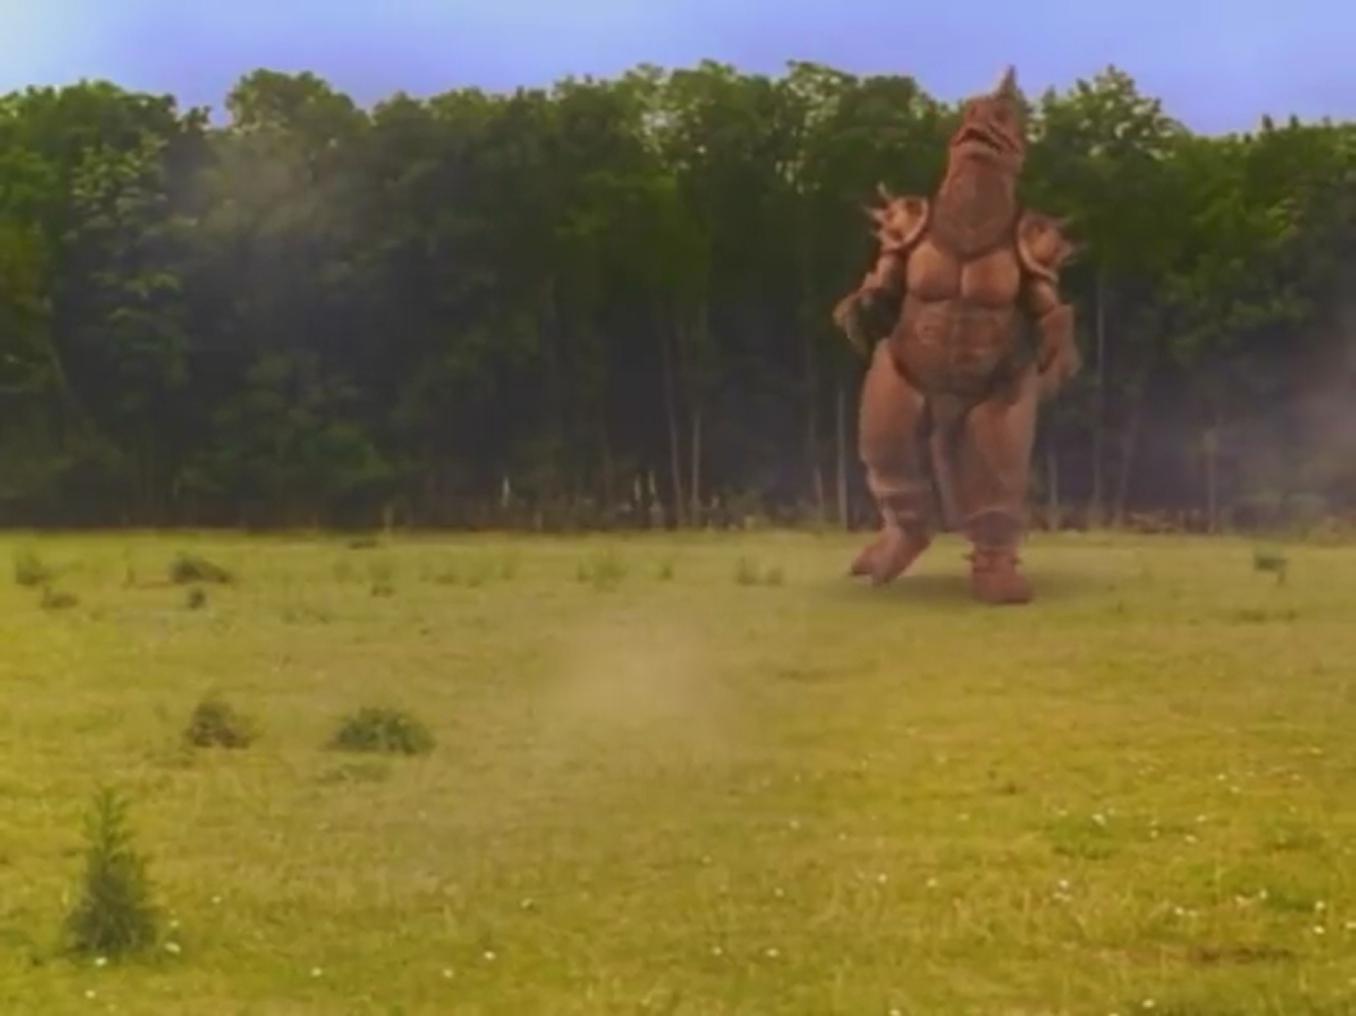 What every bad CG kaiju looks like